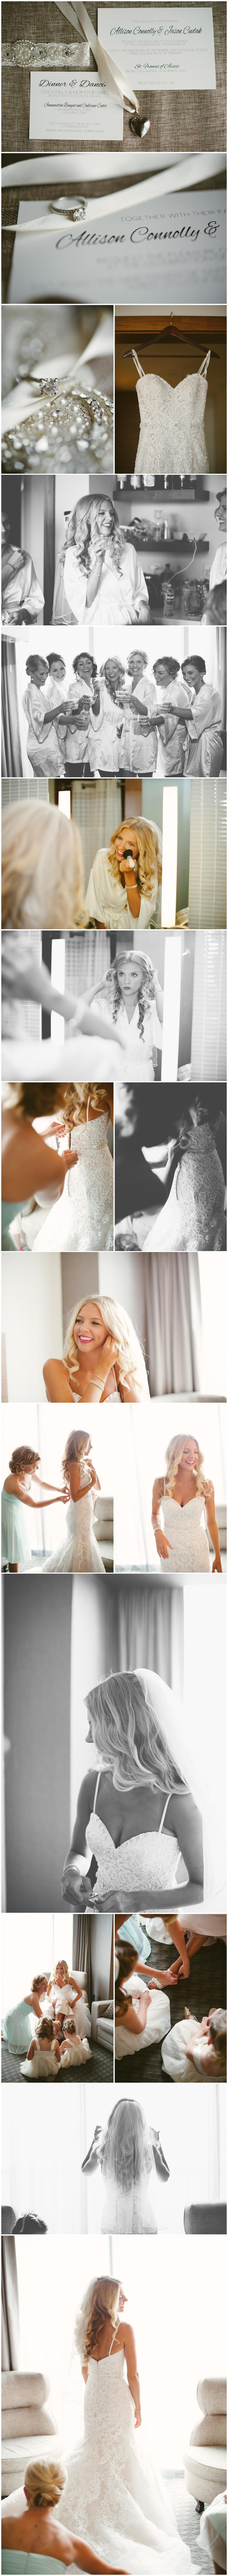 Blog Collage-A+J_W2